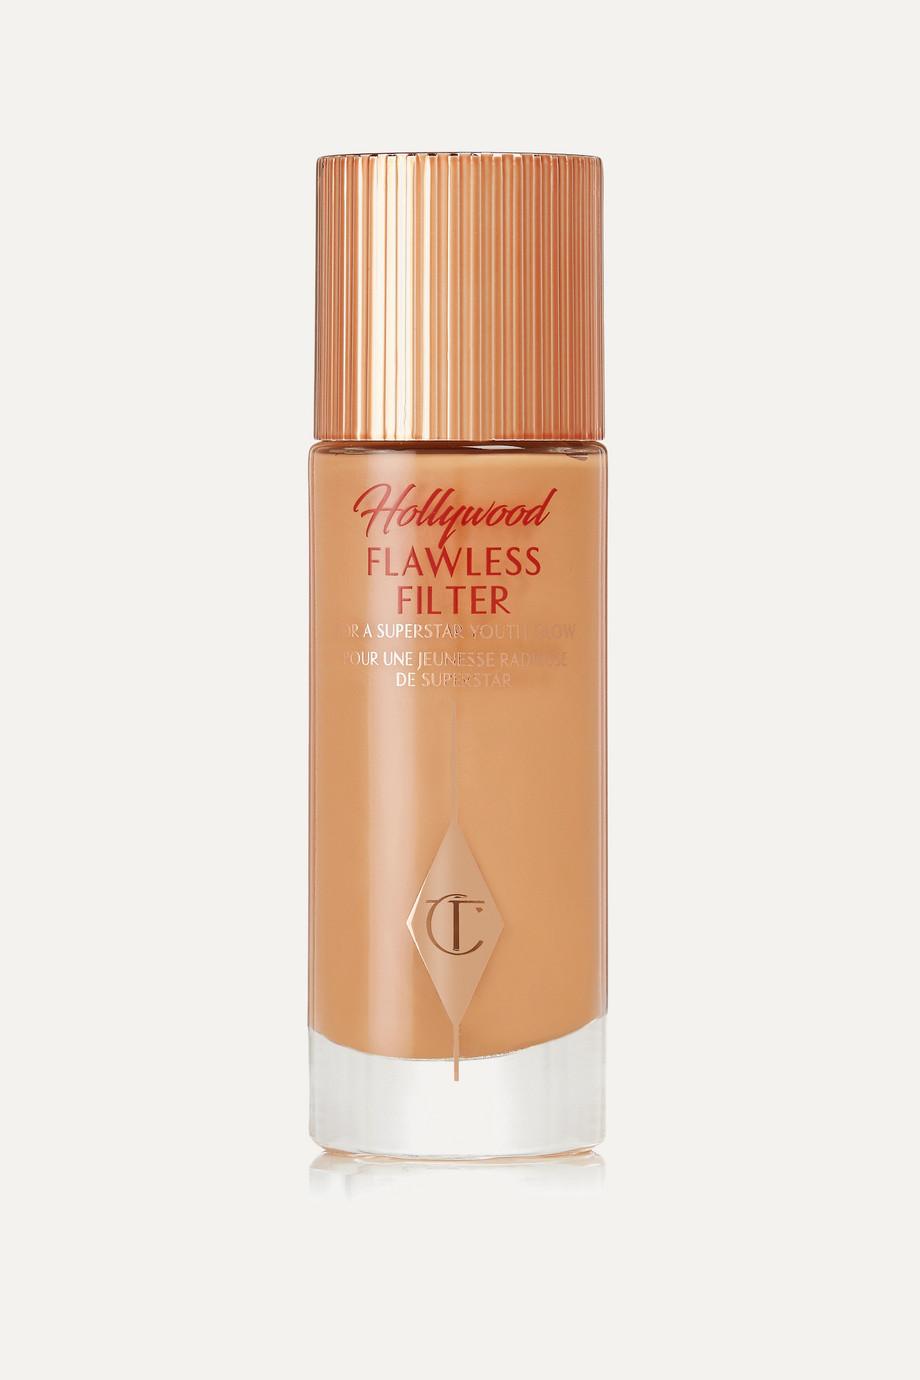 Charlotte Tilbury Hollywood Flawless Filter - 6 Dark Tan, 30ml